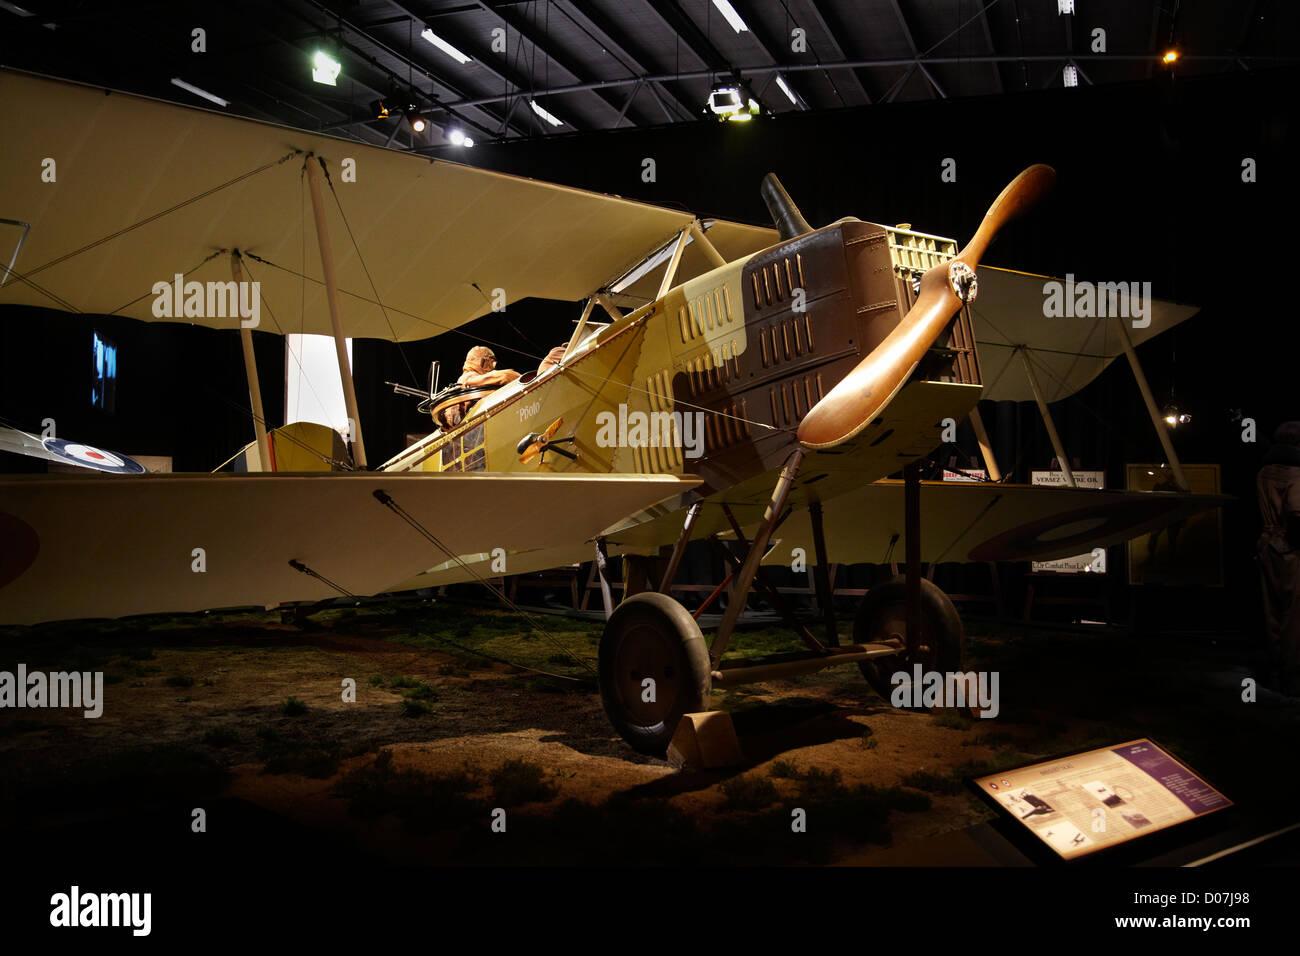 Breguet 14 A2 biplane, Omaka Aviation Heritage Centre, Blenheim, Marlborough, South Island, New Zealand - Stock Image